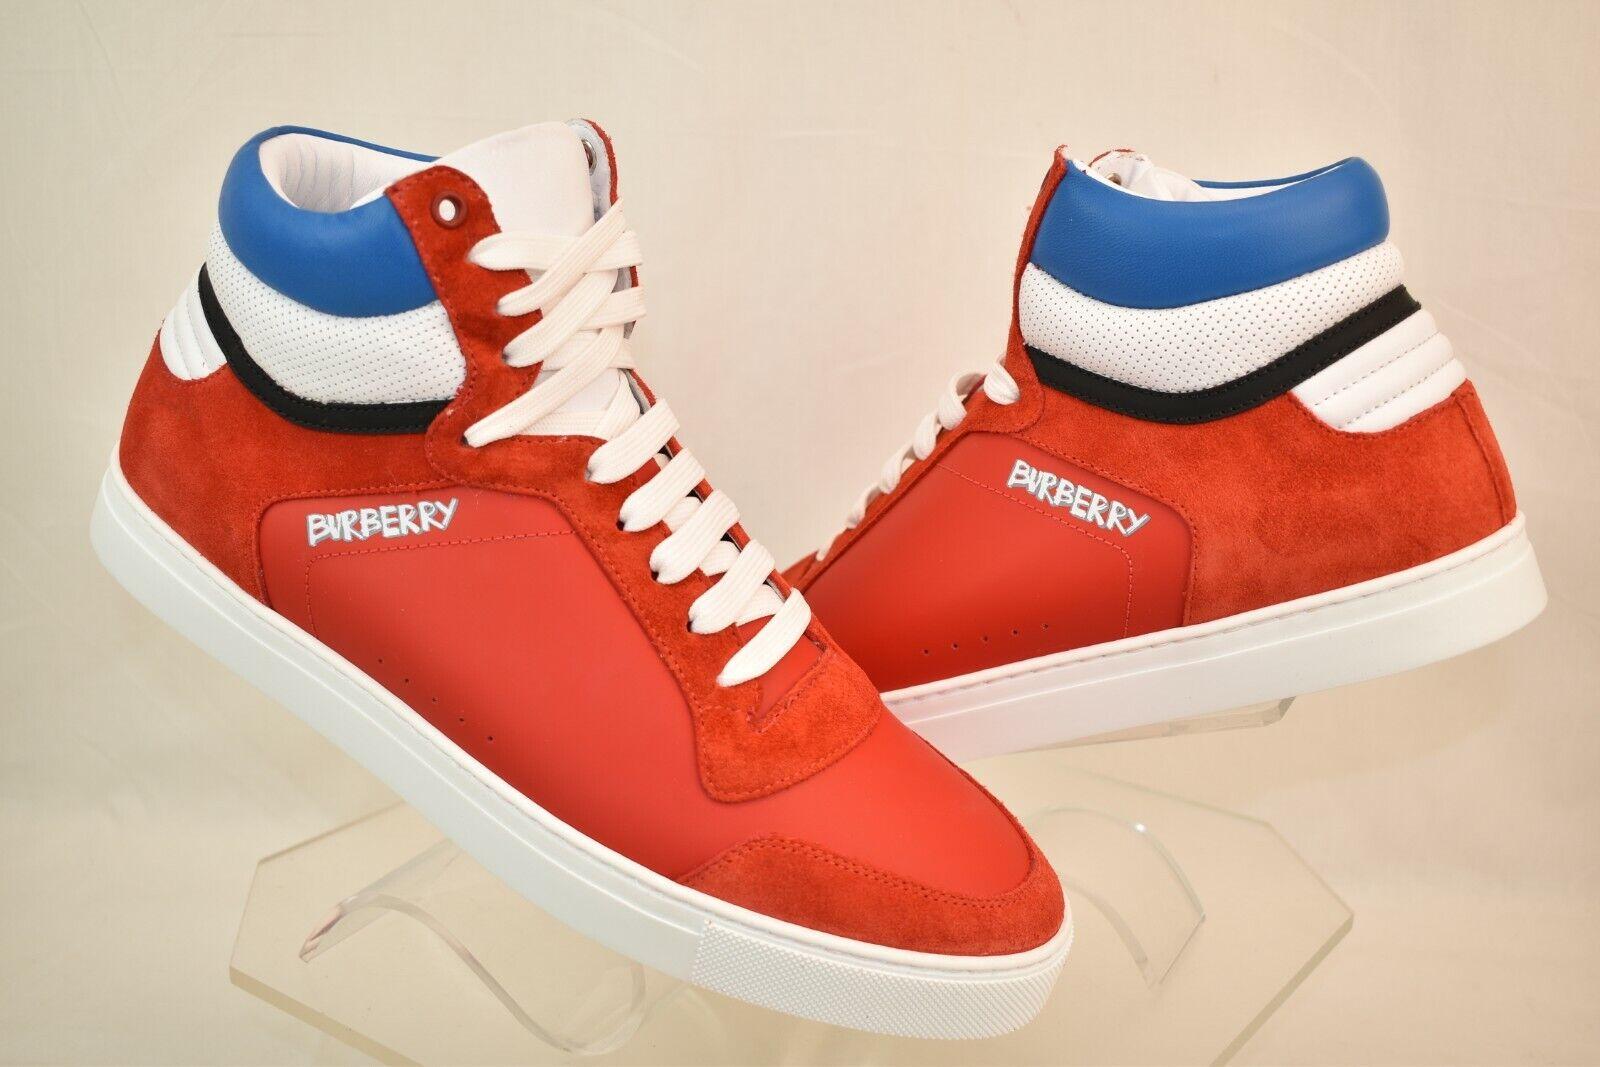 New in Box BURBERRY Reeth rouge vif cuir daim Logo Hi Top baskets 42 US 9 Italie